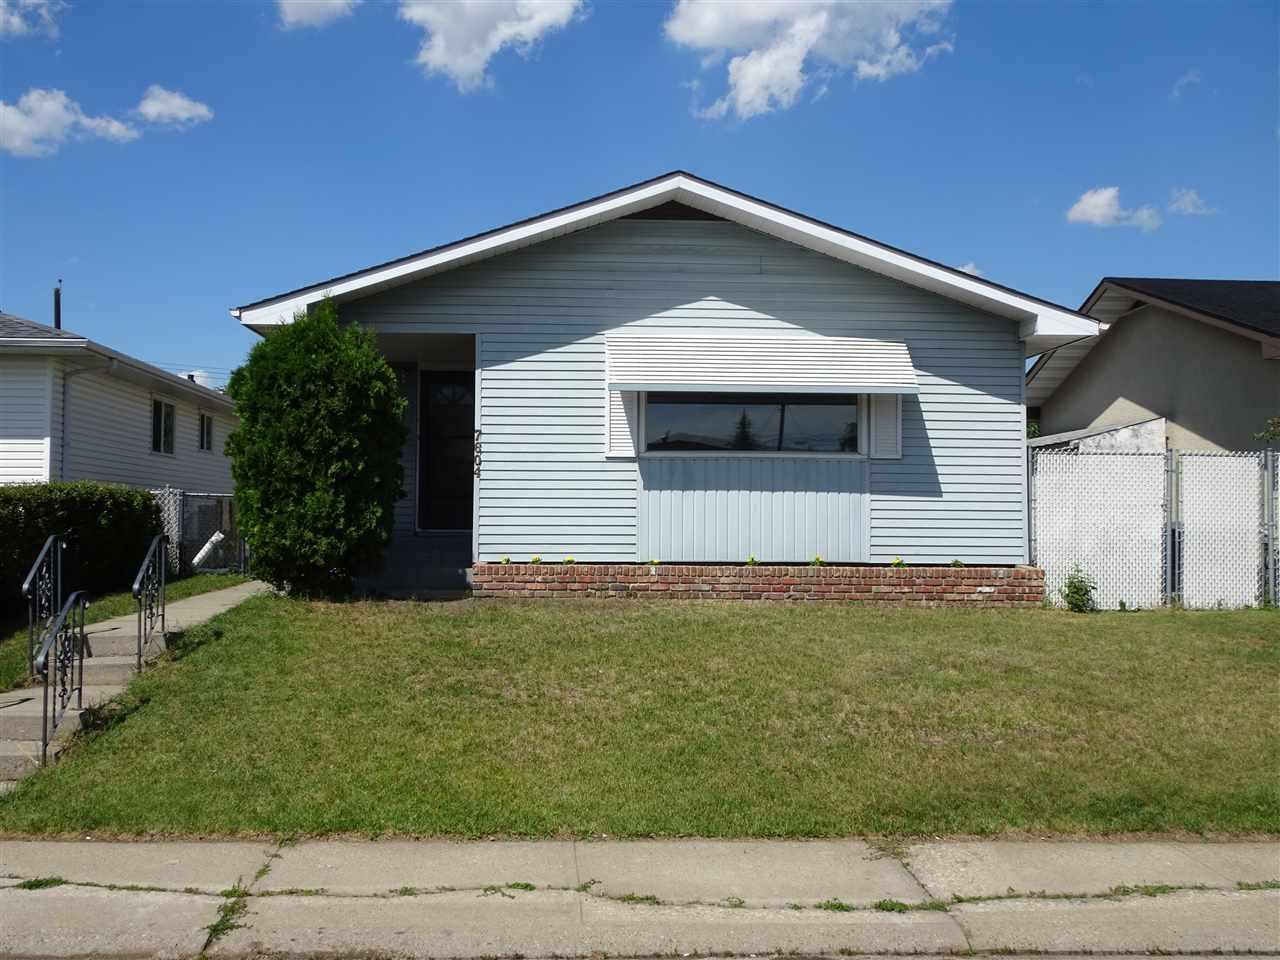 7604 135A Avenue, 4 bed, 2 bath, at $259,800